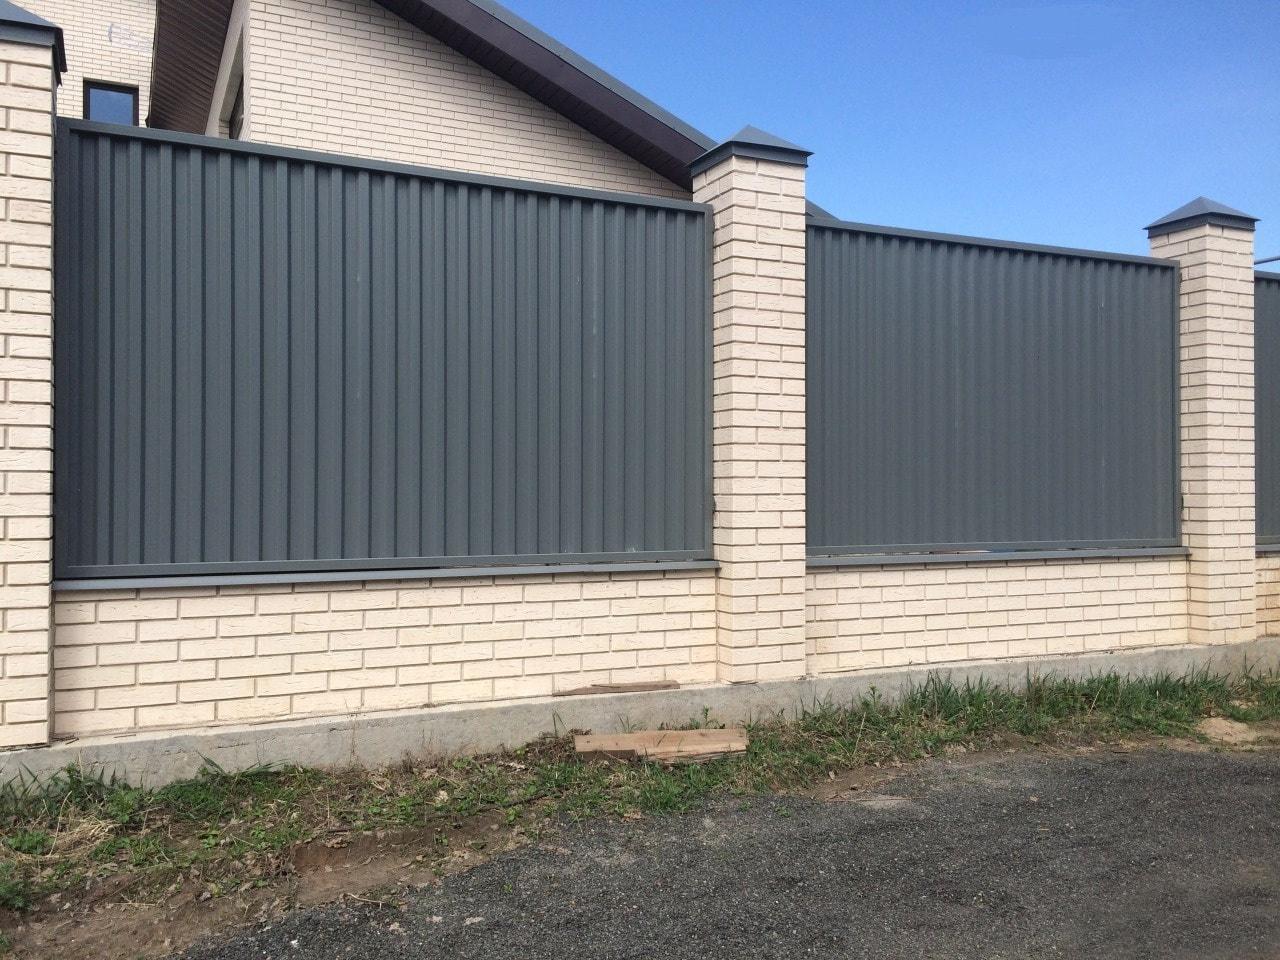 Забор для дачи из кирпича и профнастила